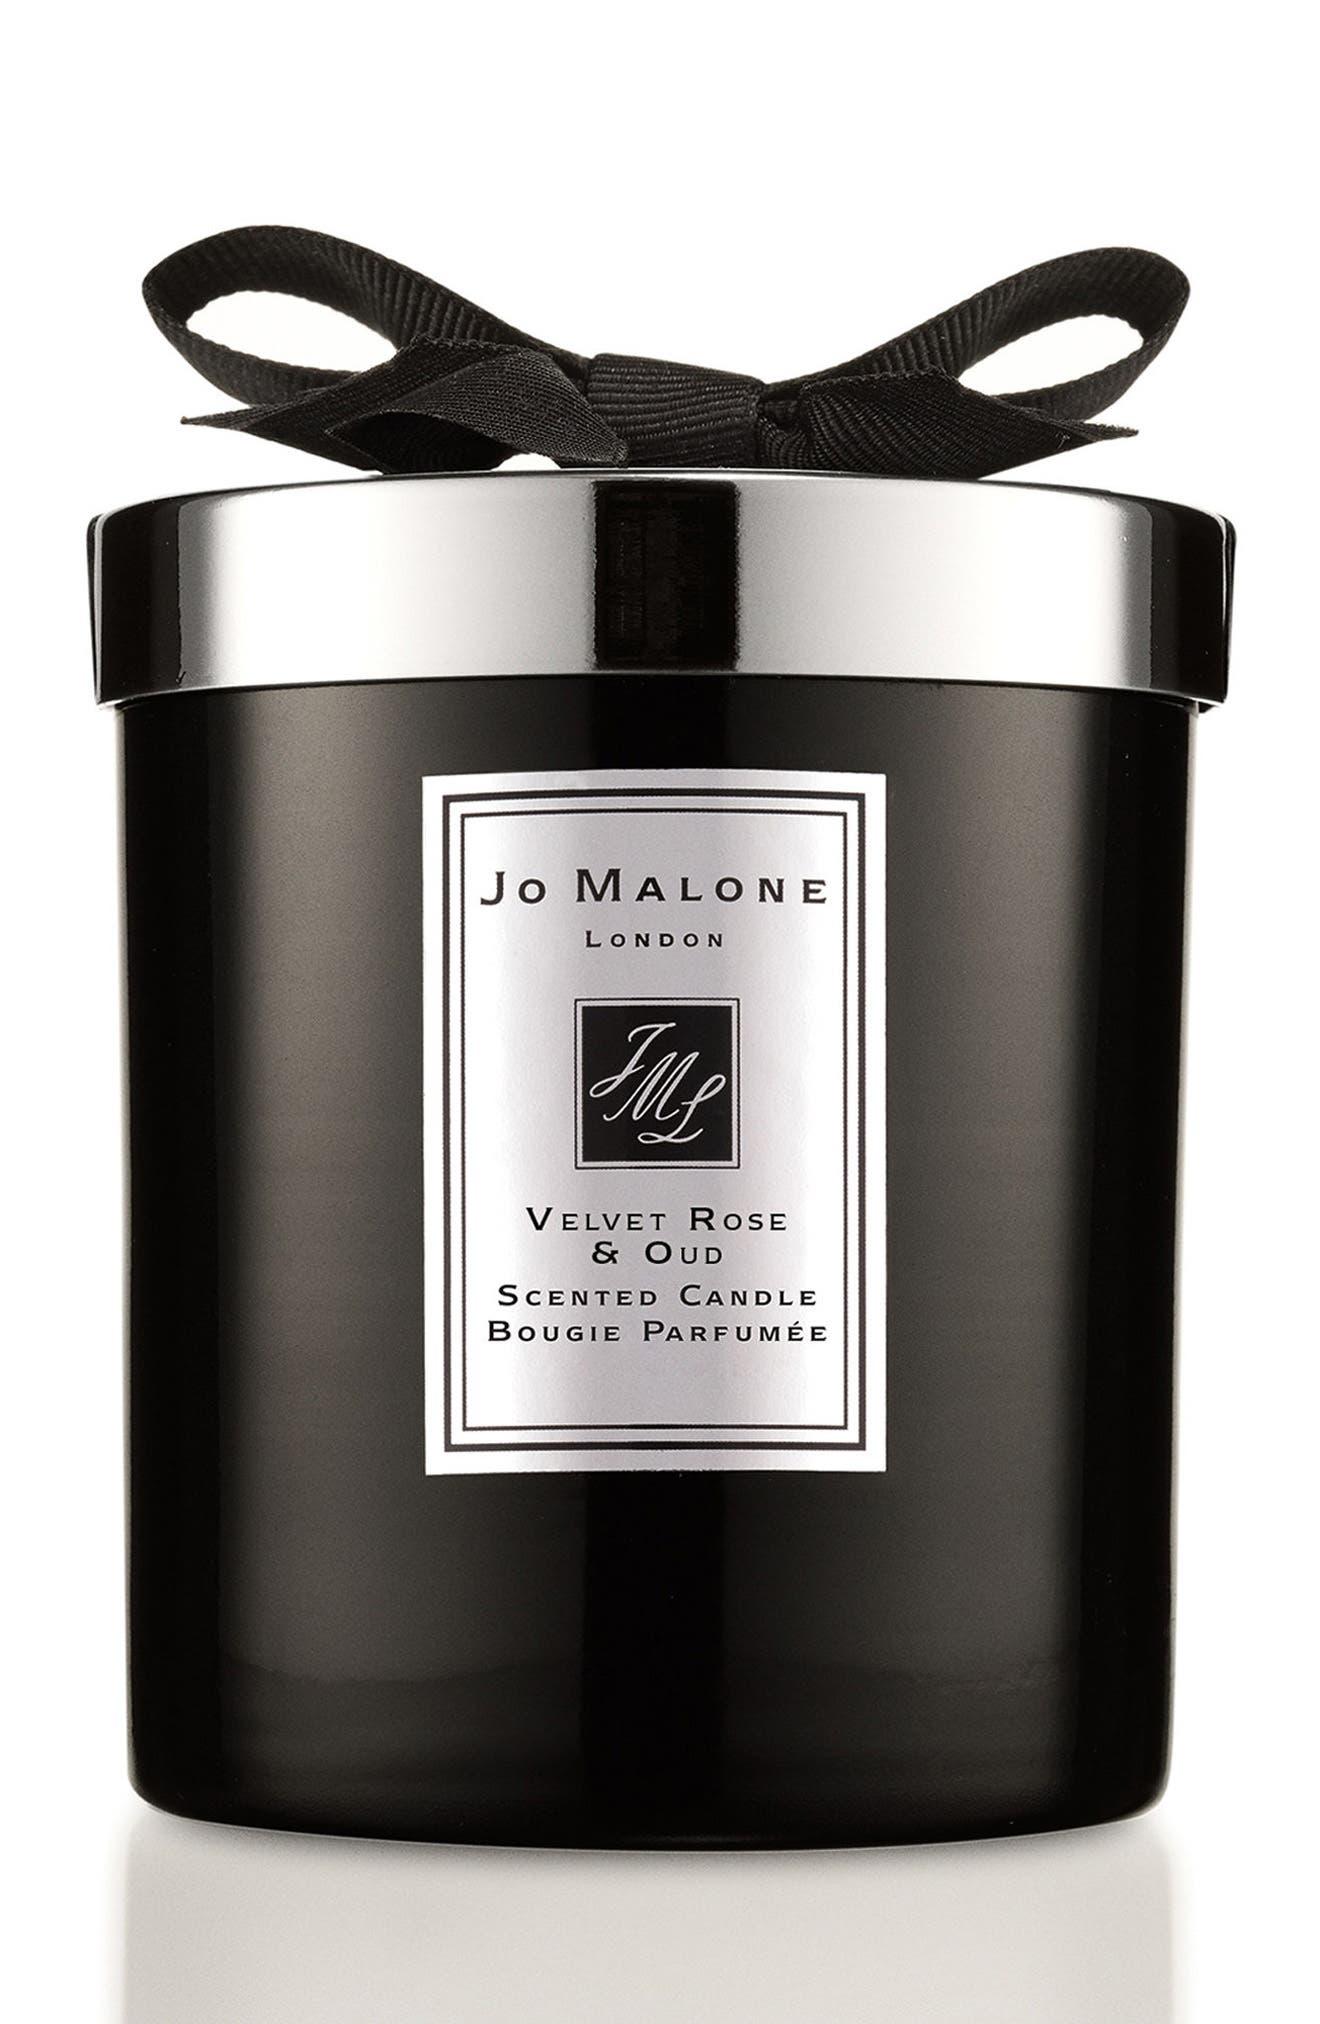 Jo Malone™ Velvet Rose & Oud Home Candle